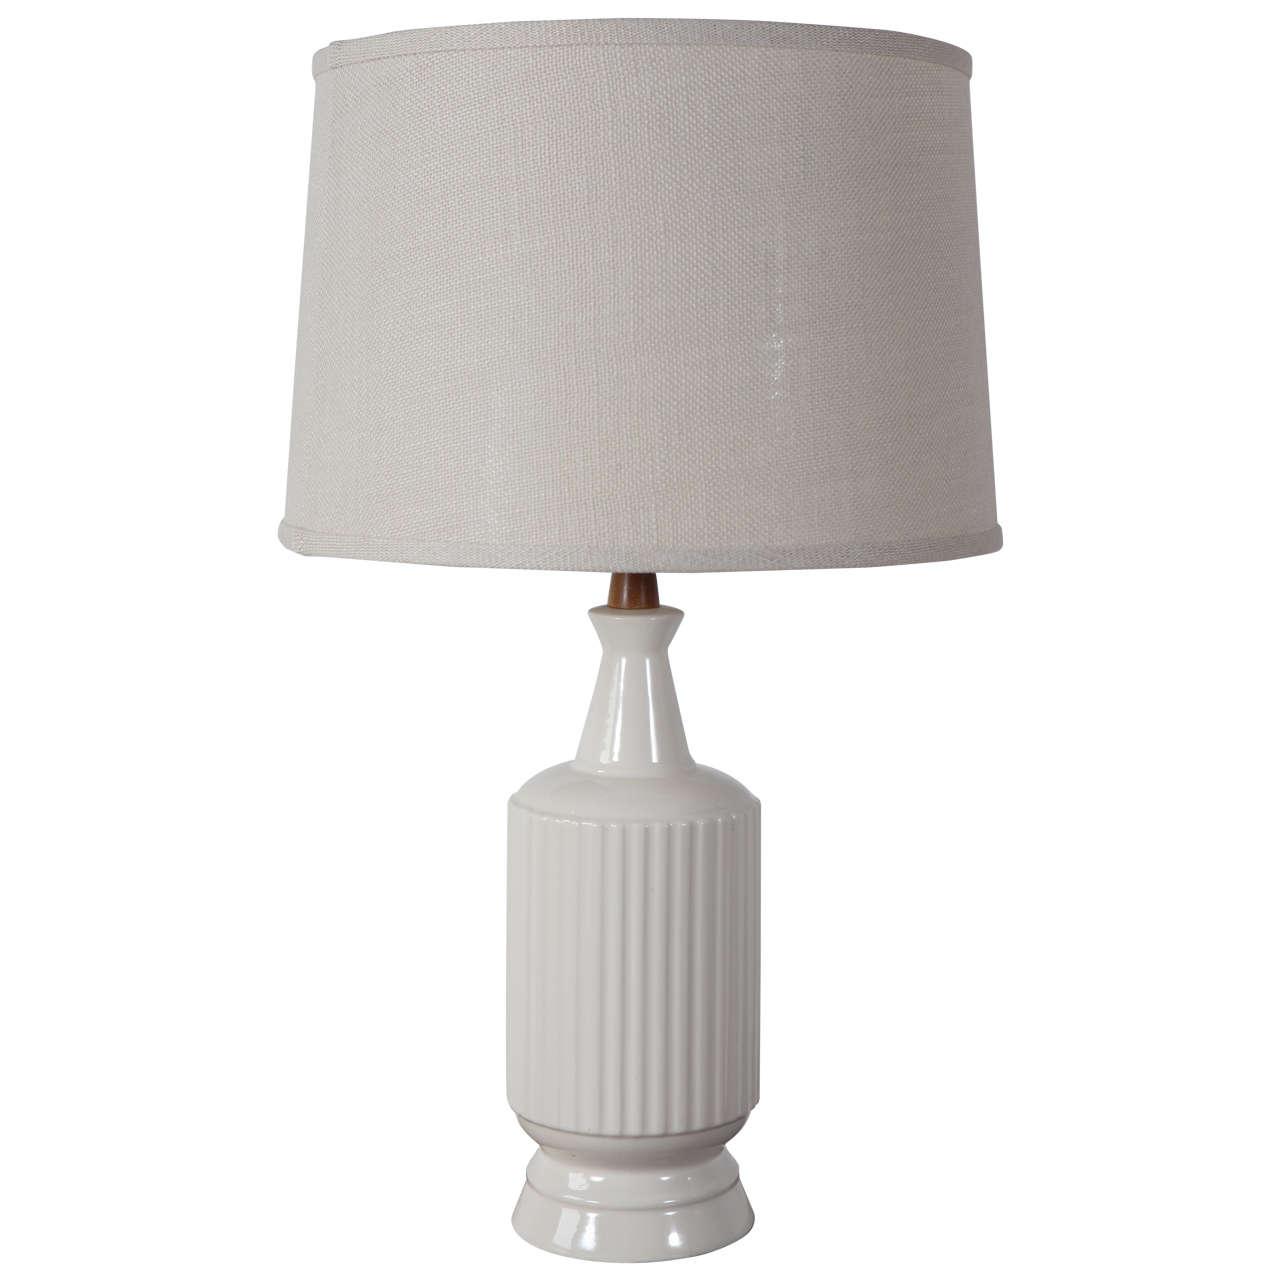 Mid Century Cream Ceramic And Teak Table Lamp At 1stdibs